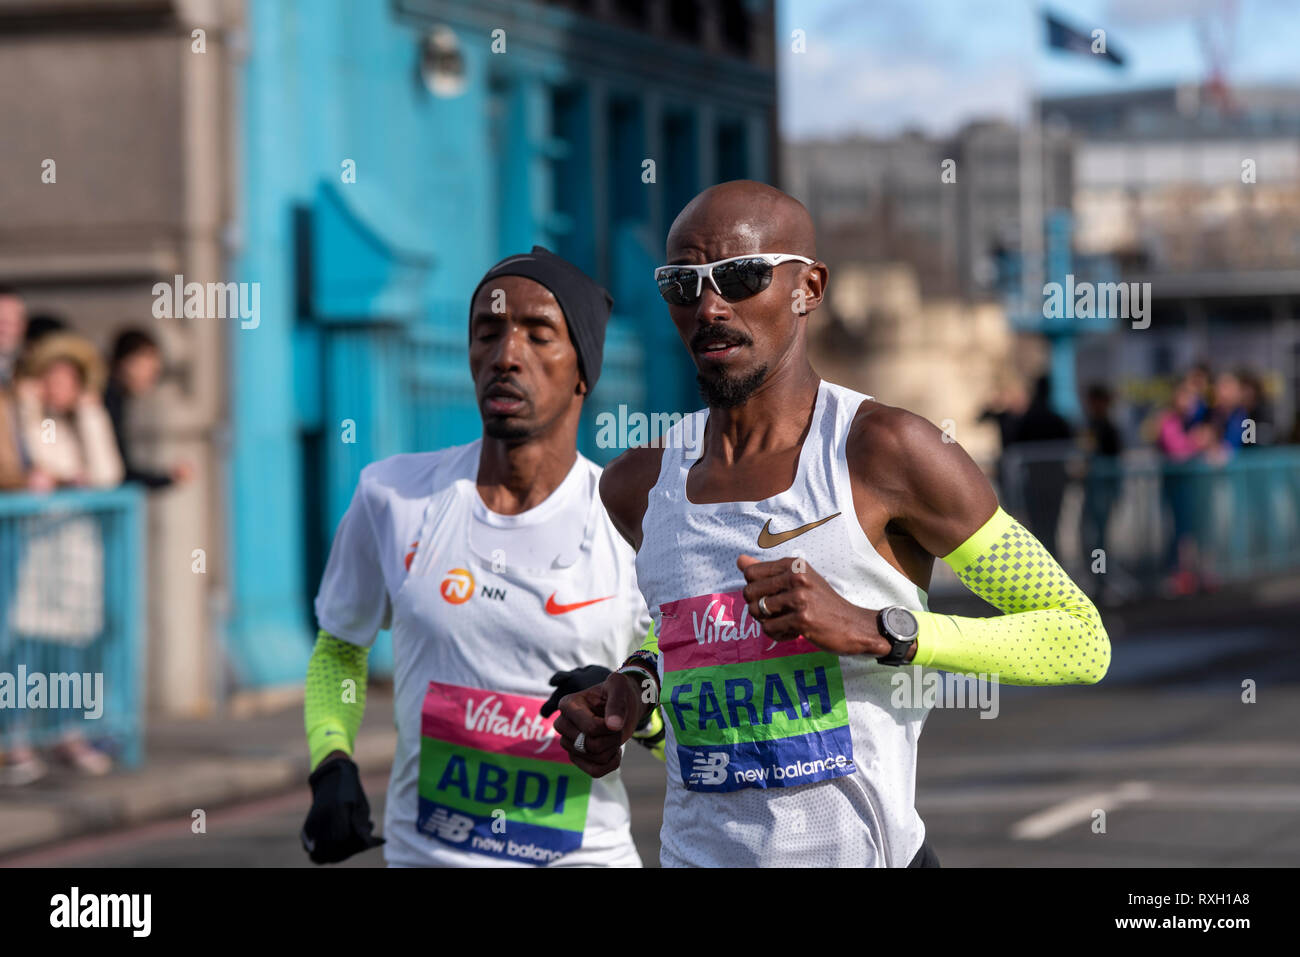 Mo Farah und Bashir Abdi läuft in der Vitalität große Hälfte Halbmarathon crossing Tower Bridge, London, UK. Stockbild